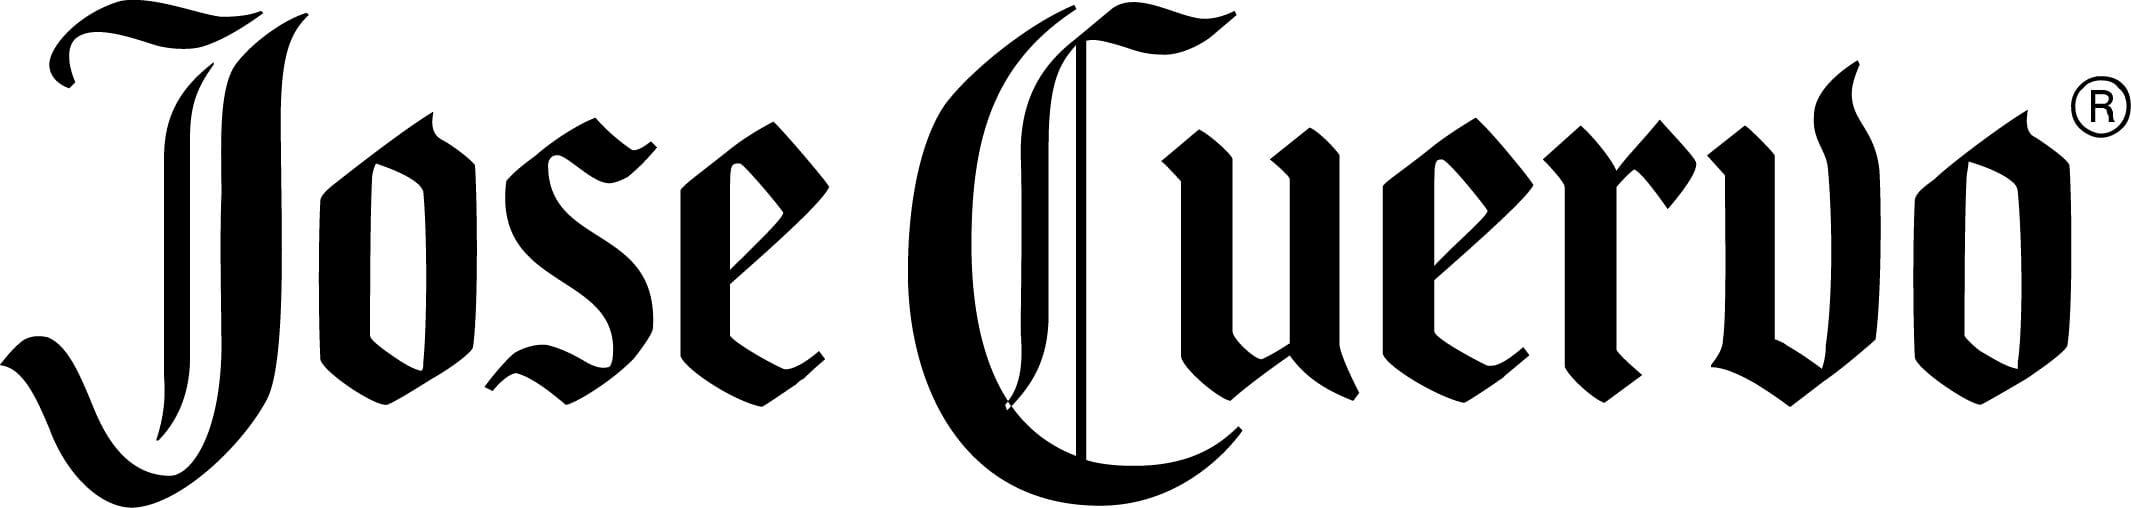 Jose cuervo Logos.